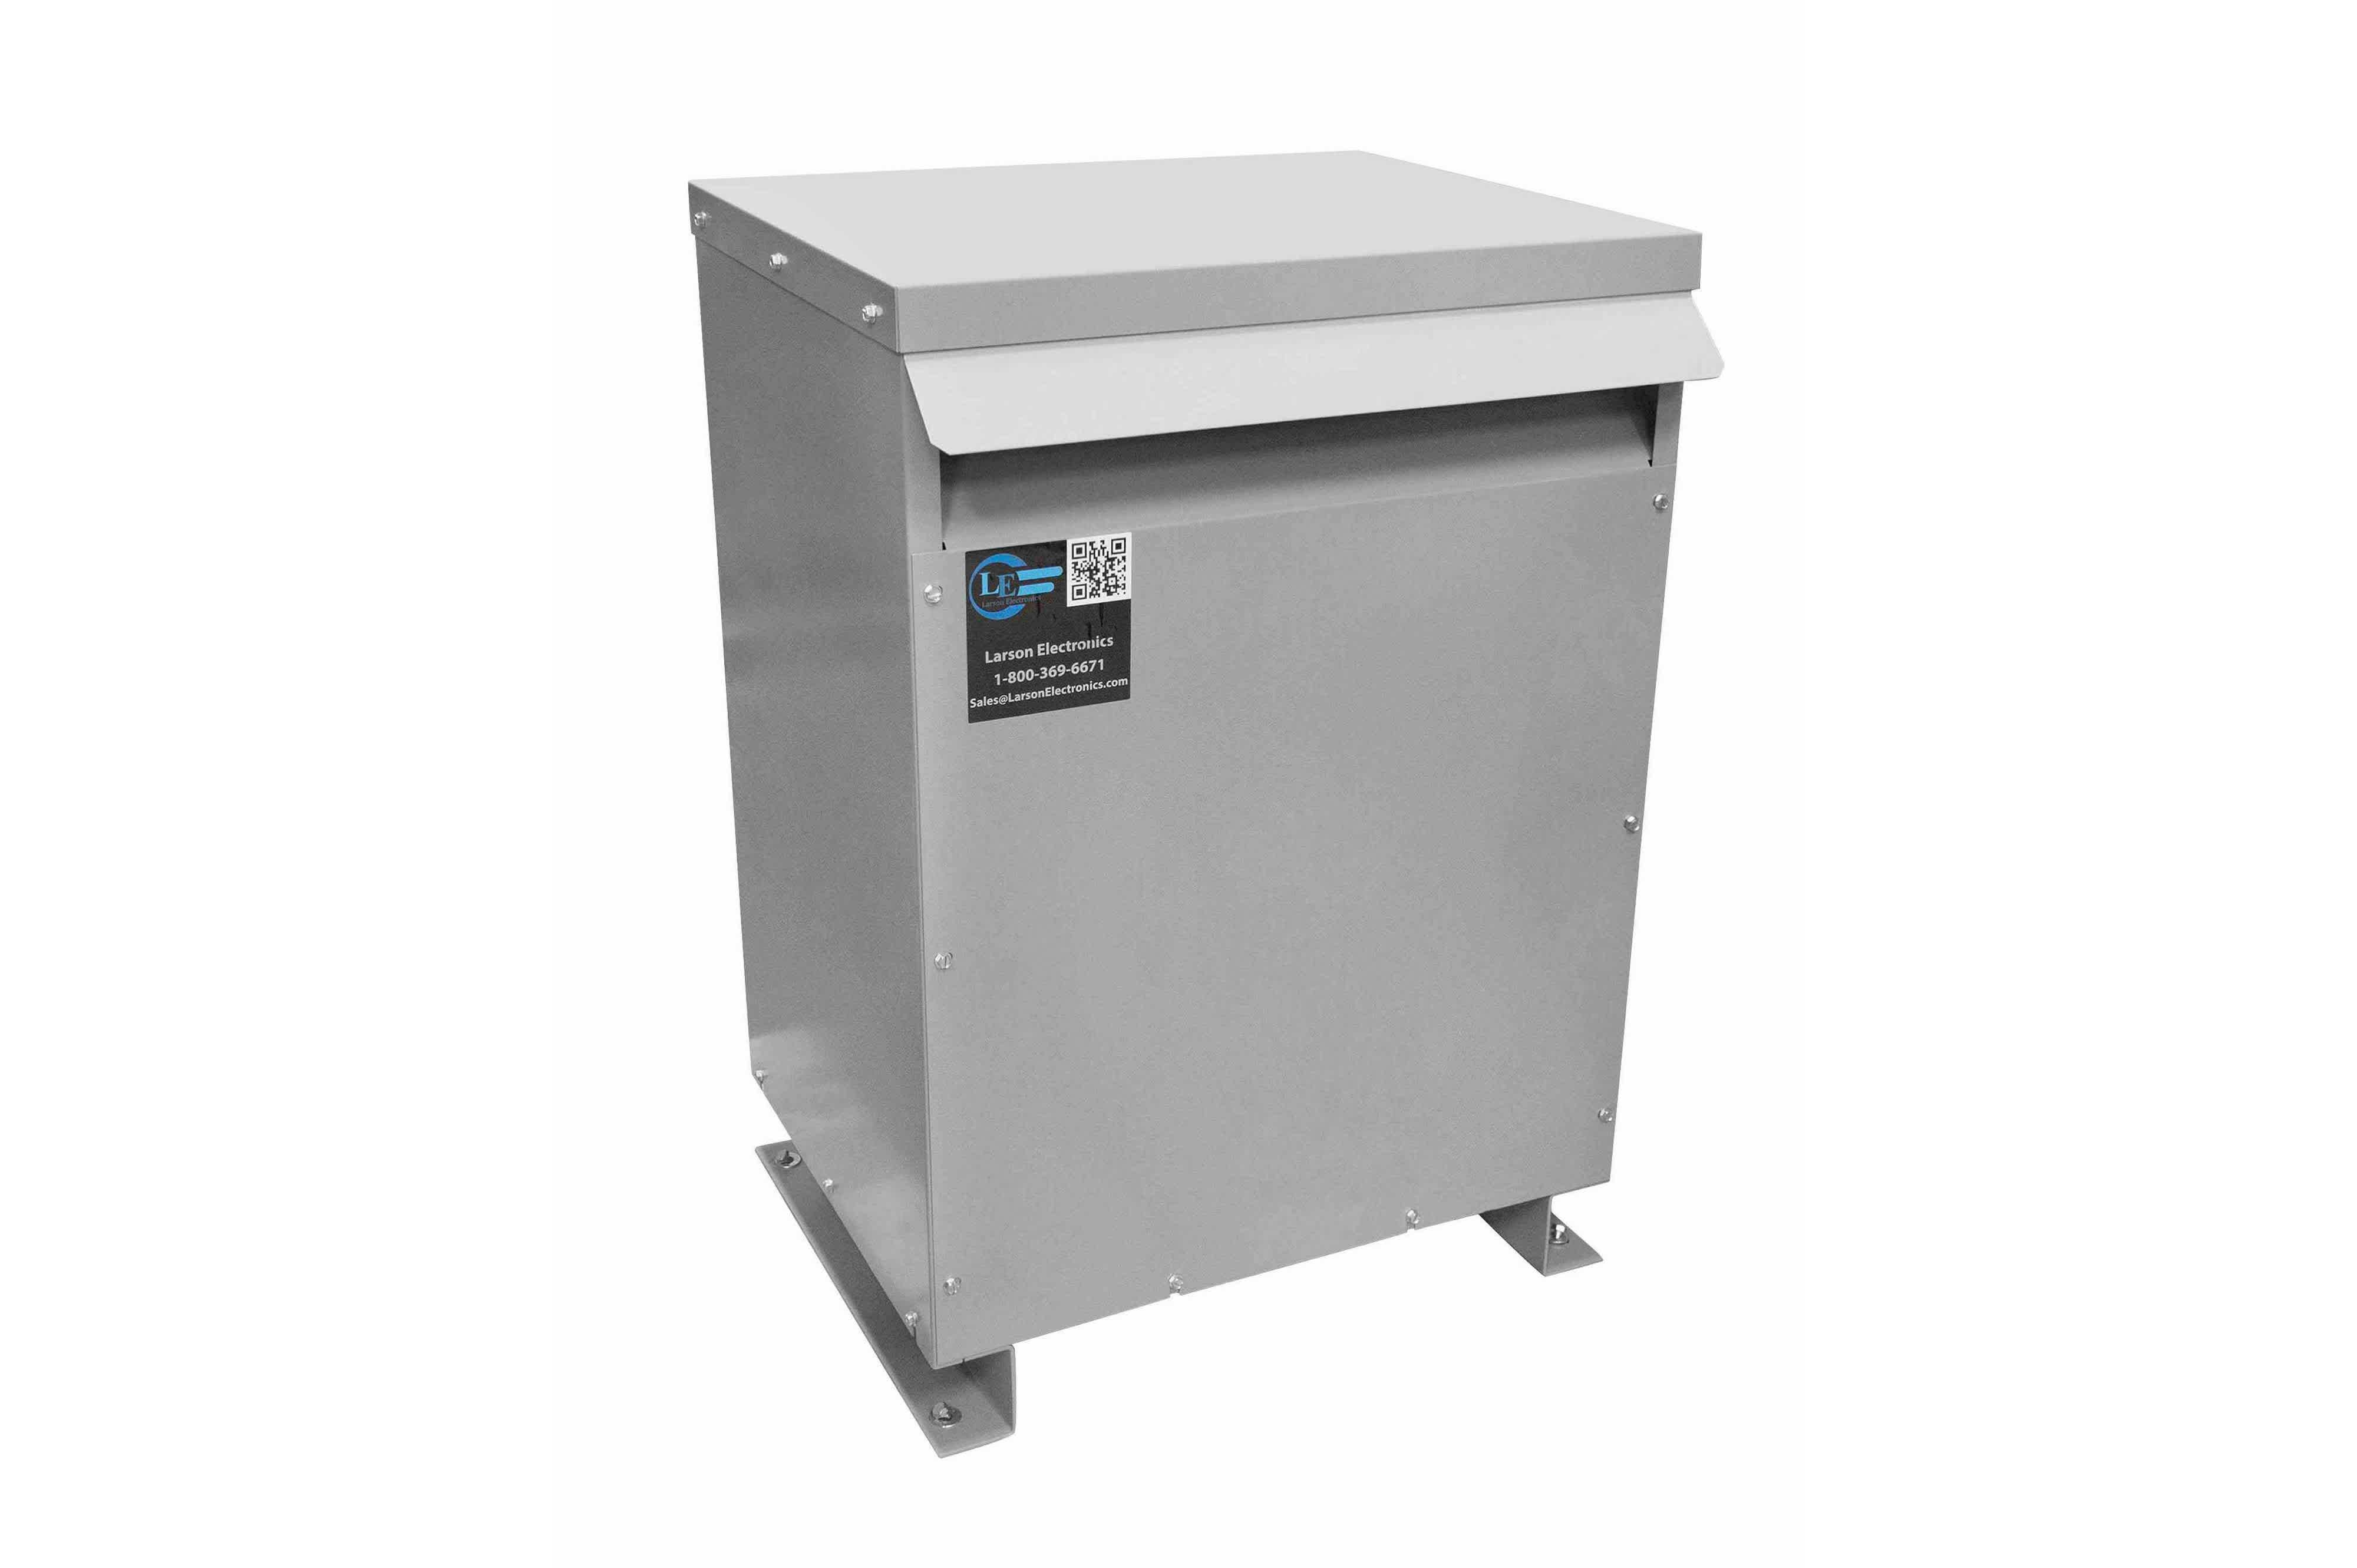 90 kVA 3PH Isolation Transformer, 575V Wye Primary, 415Y/240 Wye-N Secondary, N3R, Ventilated, 60 Hz